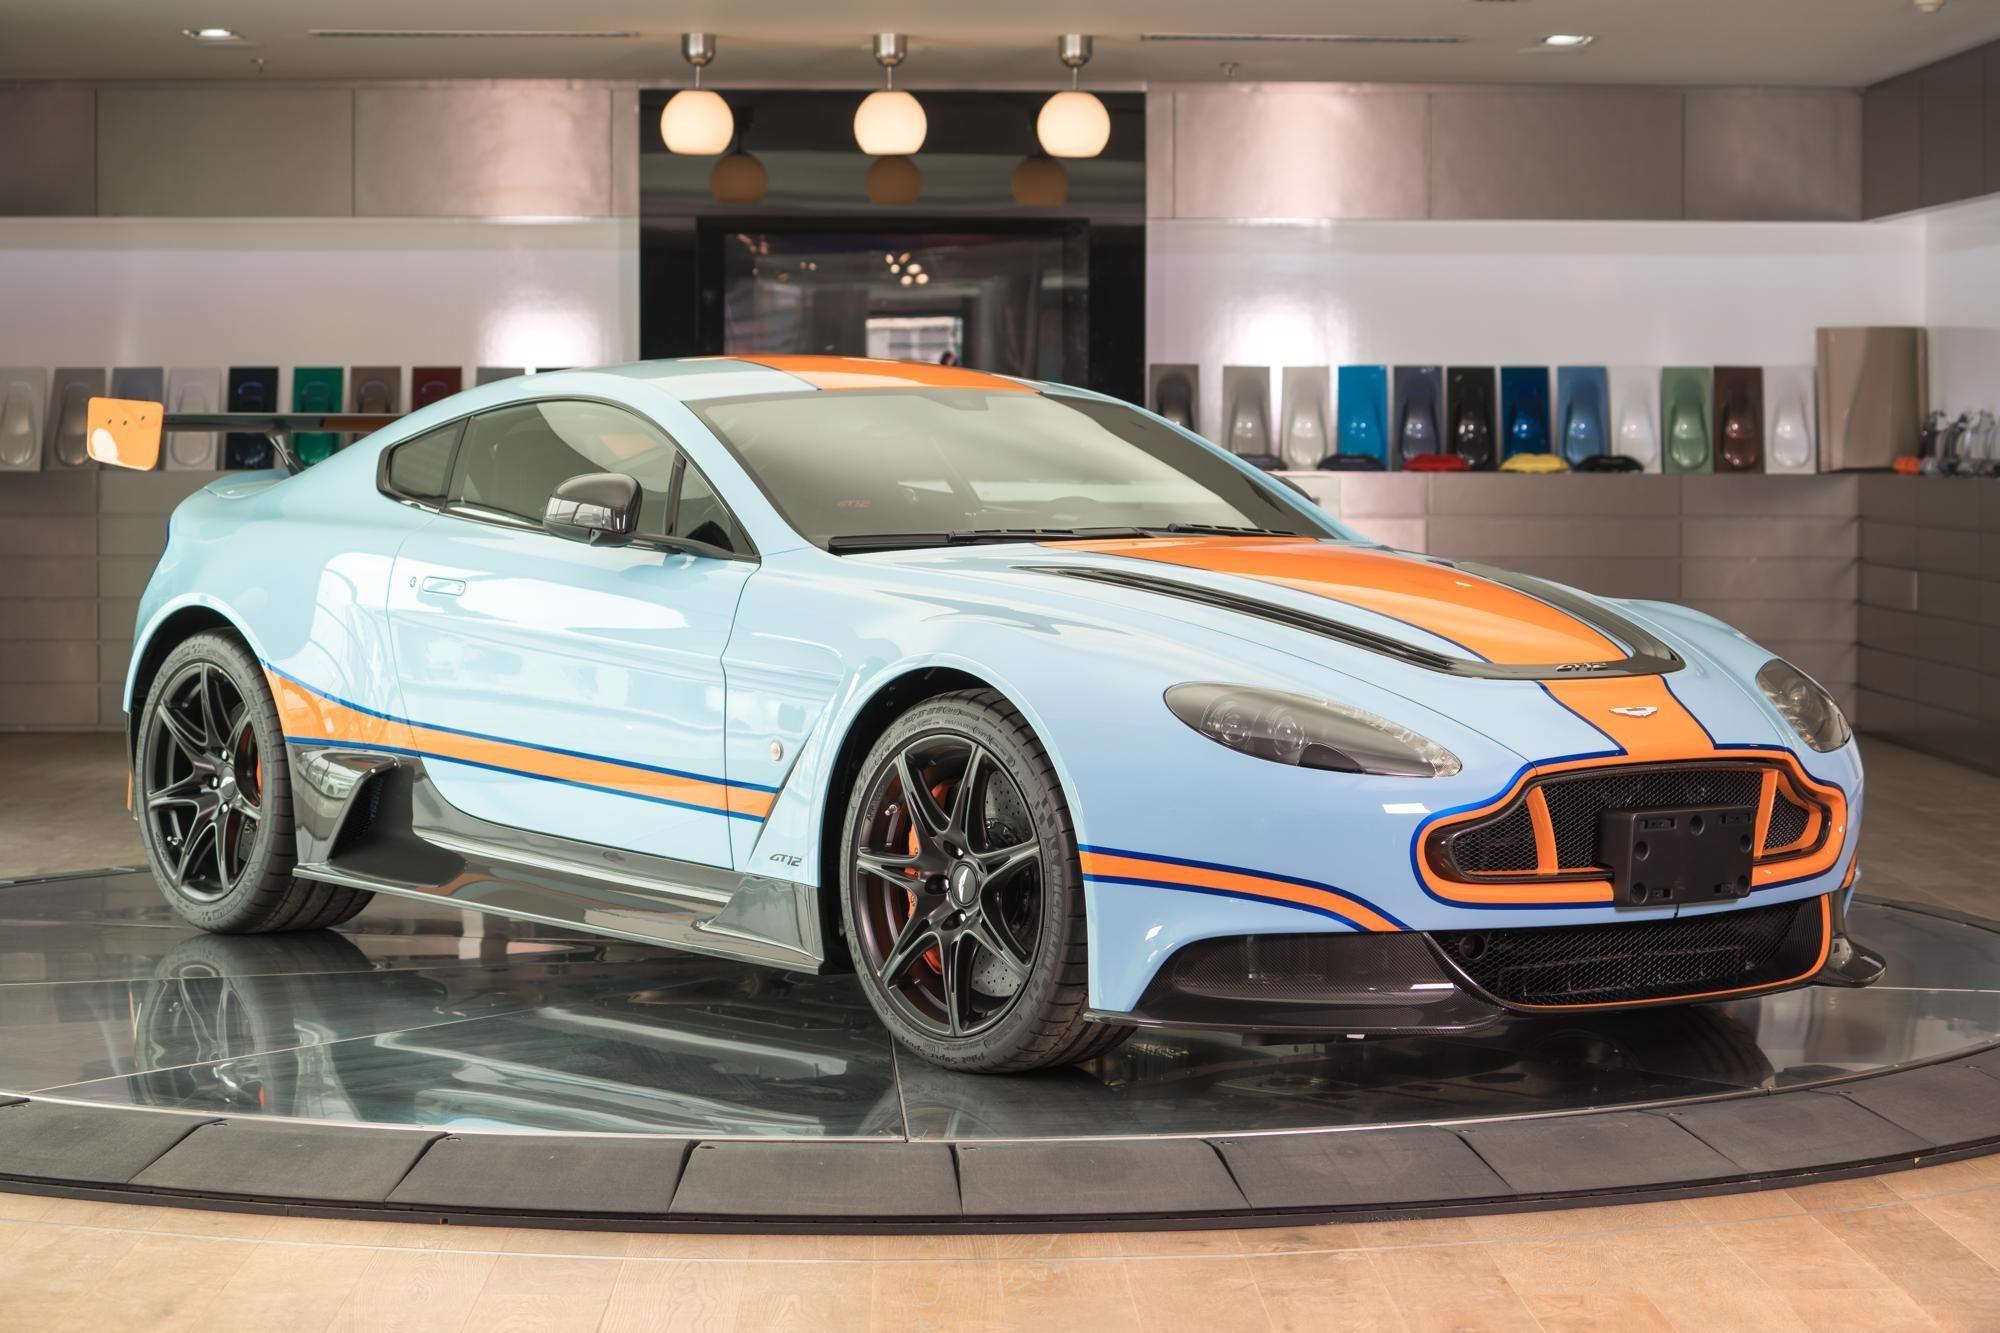 2015 Aston Martin V12 Gt In Dubai United Arab Emirates For Sale 10937332